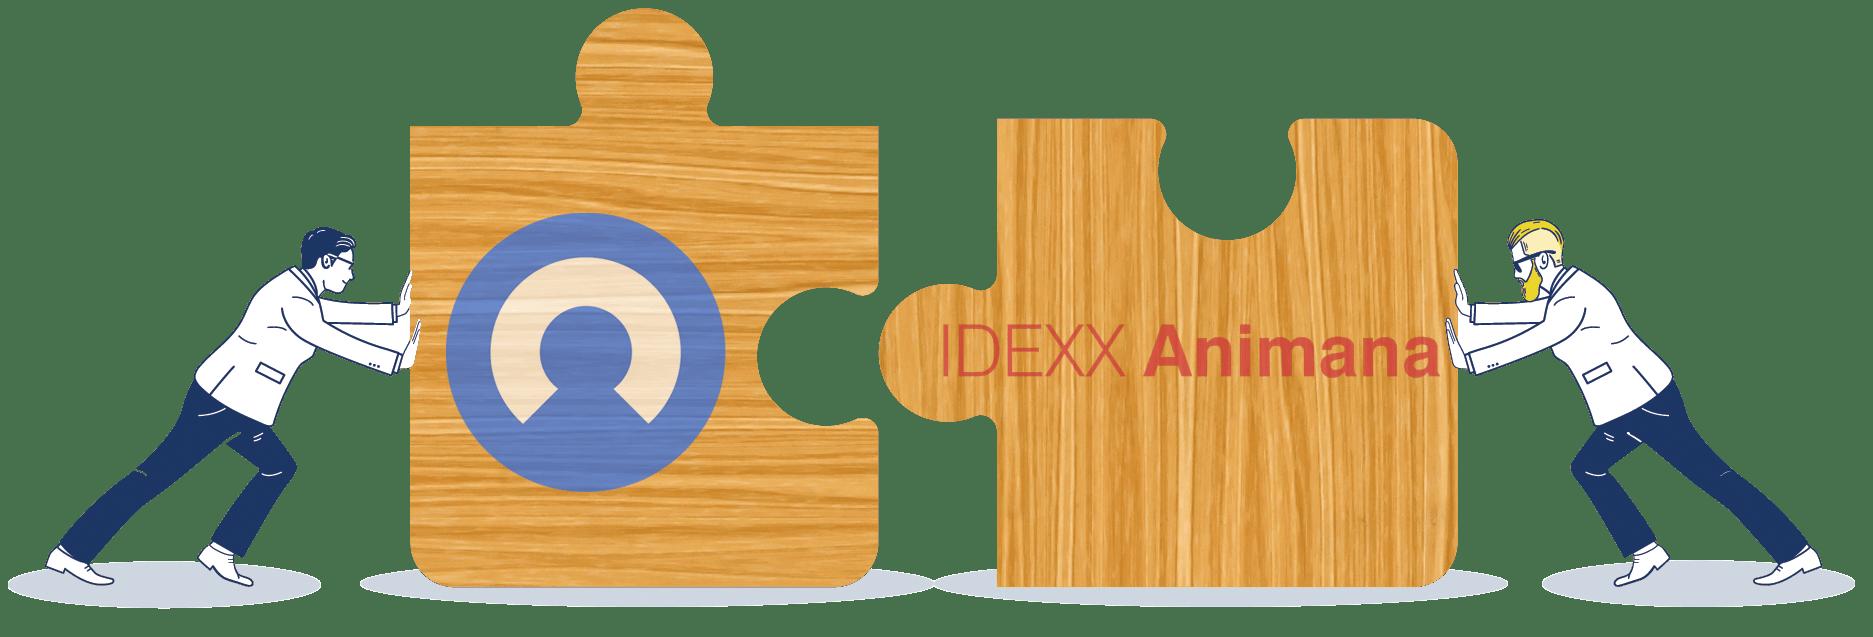 IDEXX Animana + slimme telefonie